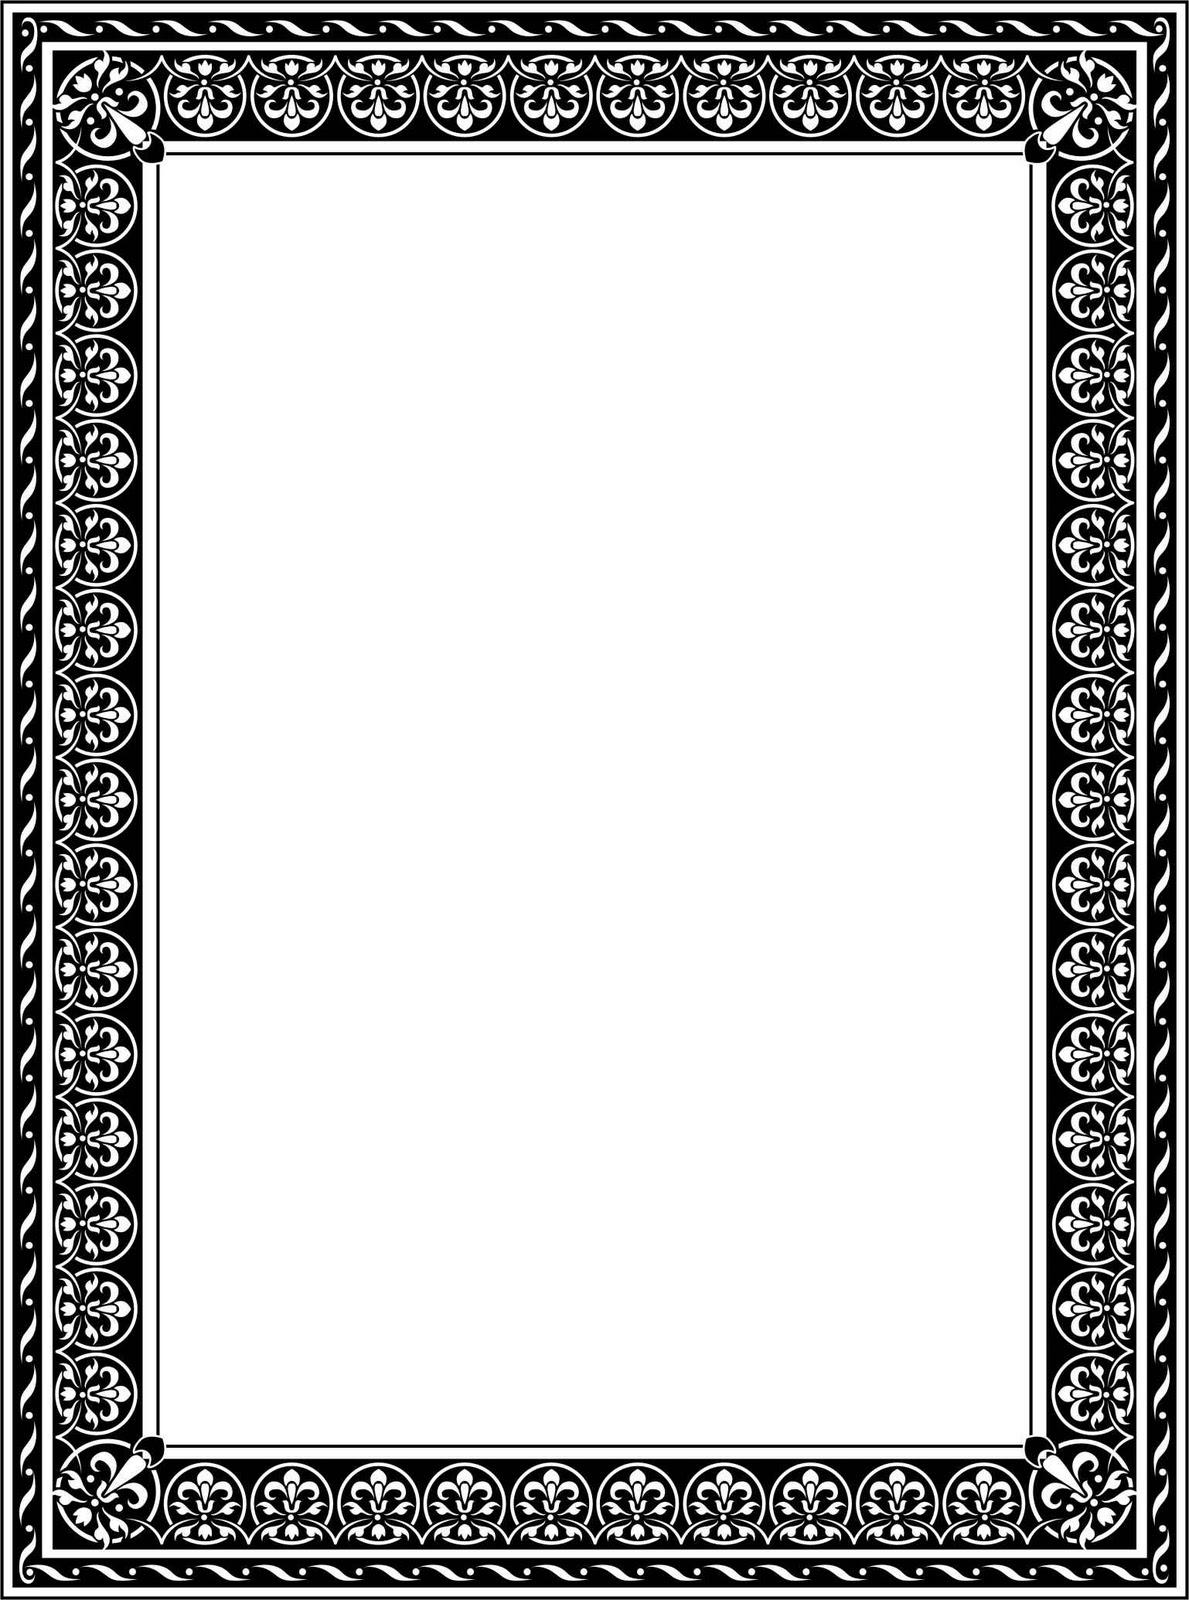 Bingkai / Border Piagam Vector (1)